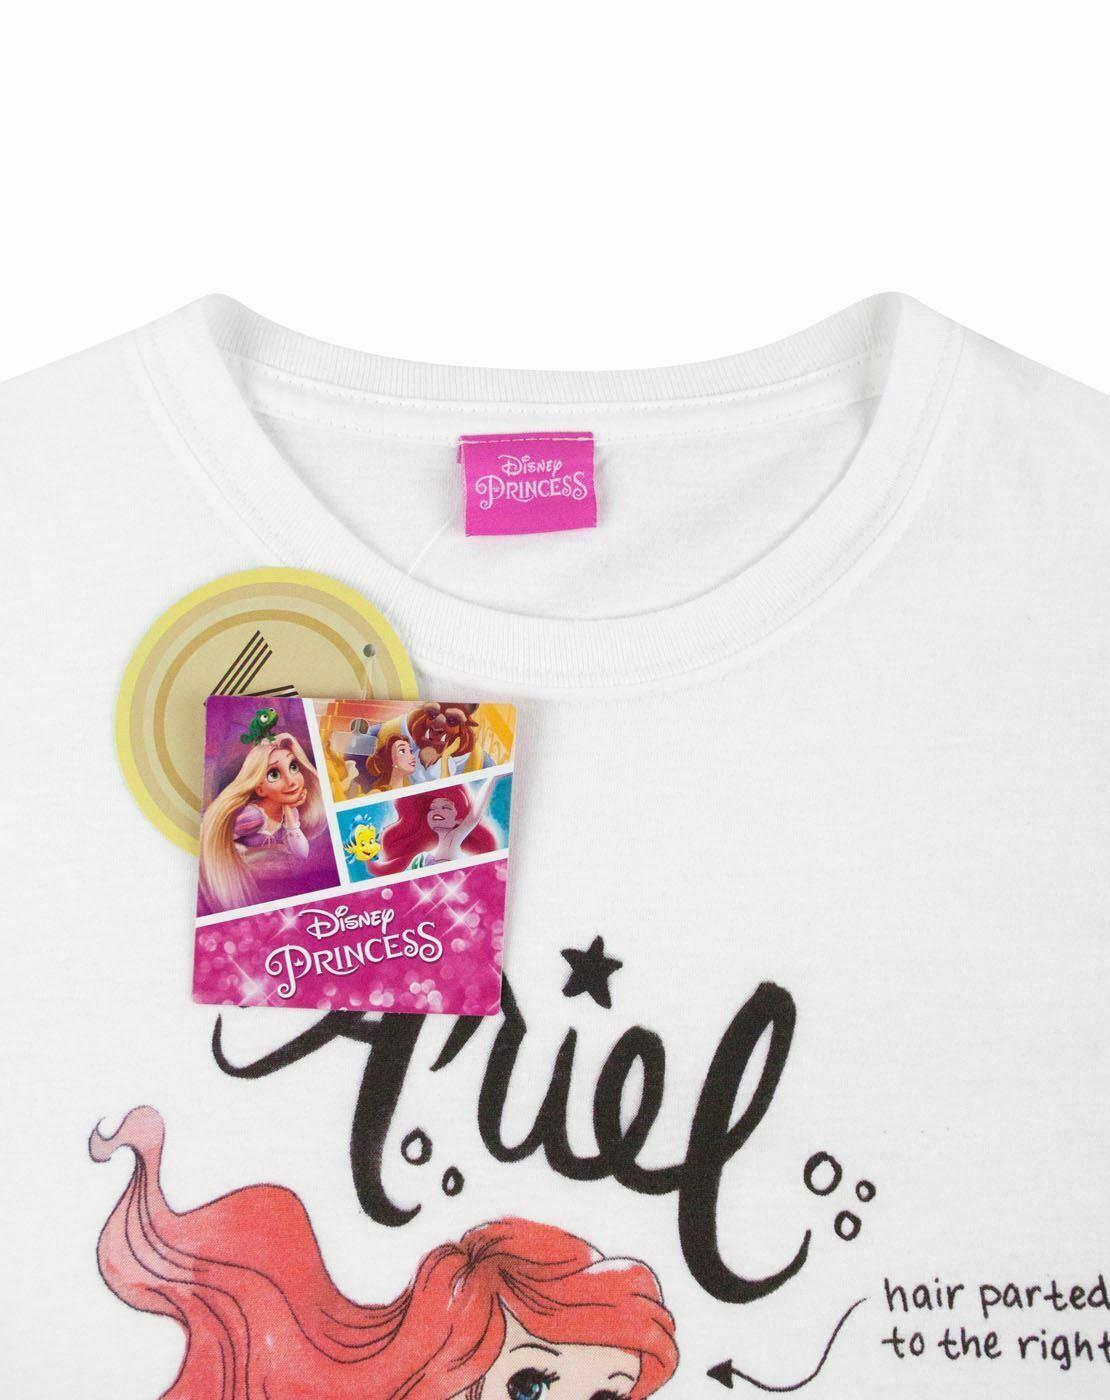 Disney-The-Little-Mermaid-Ariel-Women-039-s-T-Shirt thumbnail 9